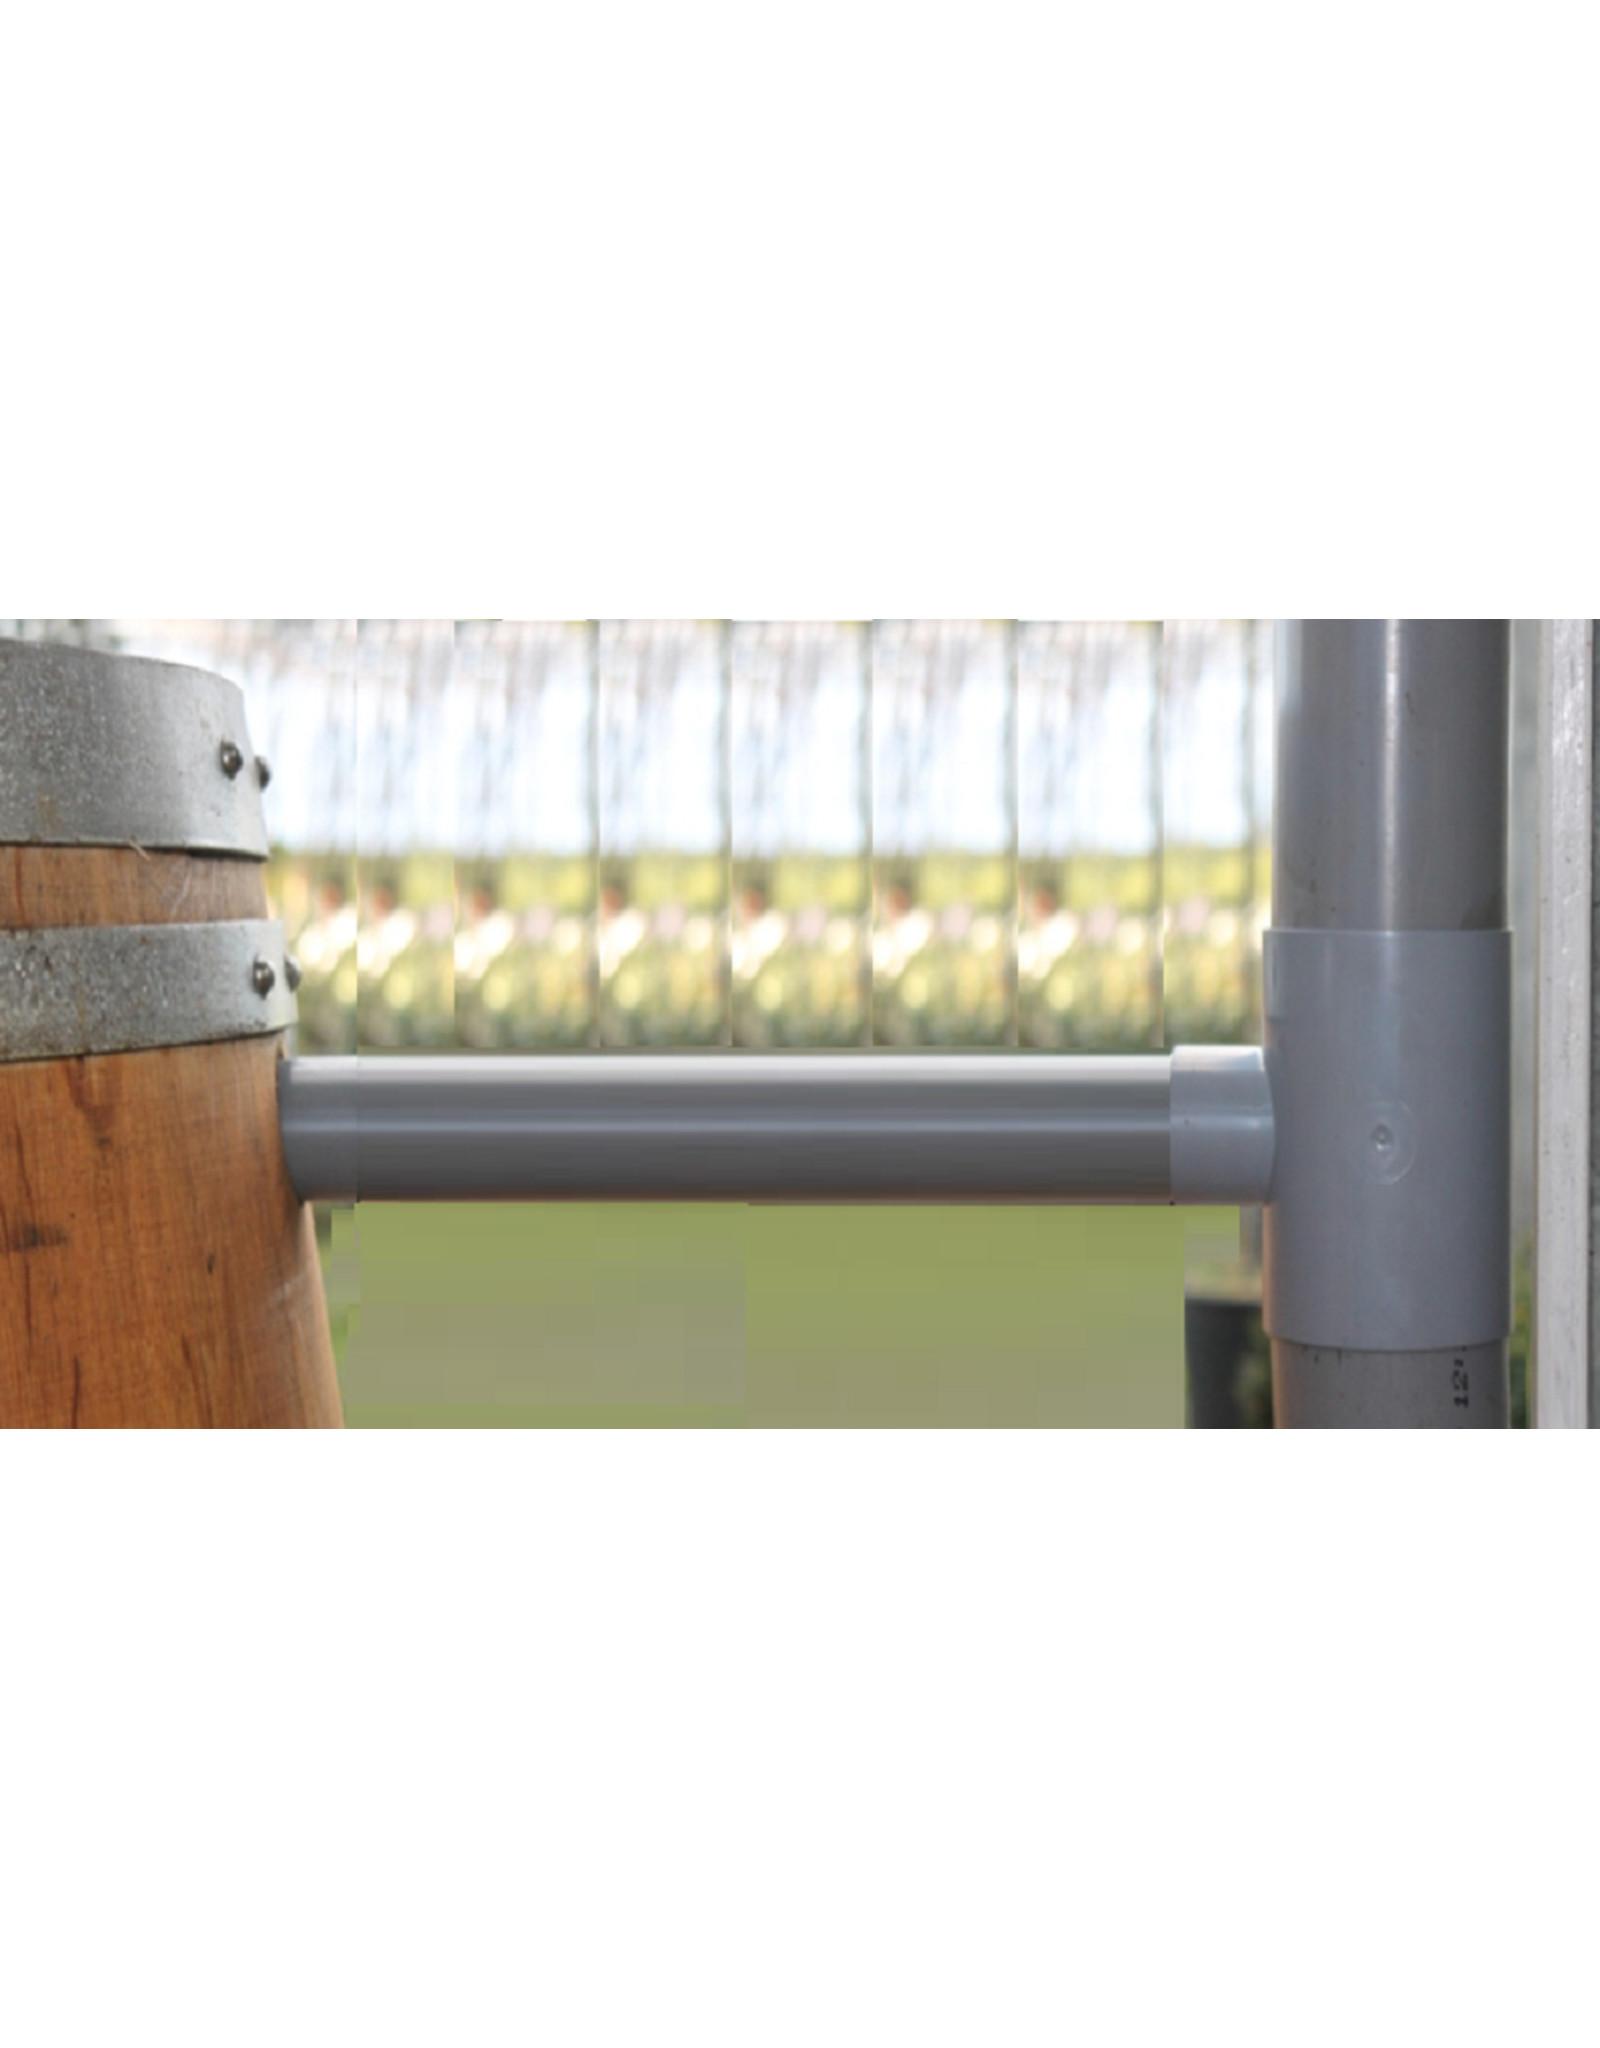 Regenton vulautomaat 70/80 mm + 50cm verlengbuis